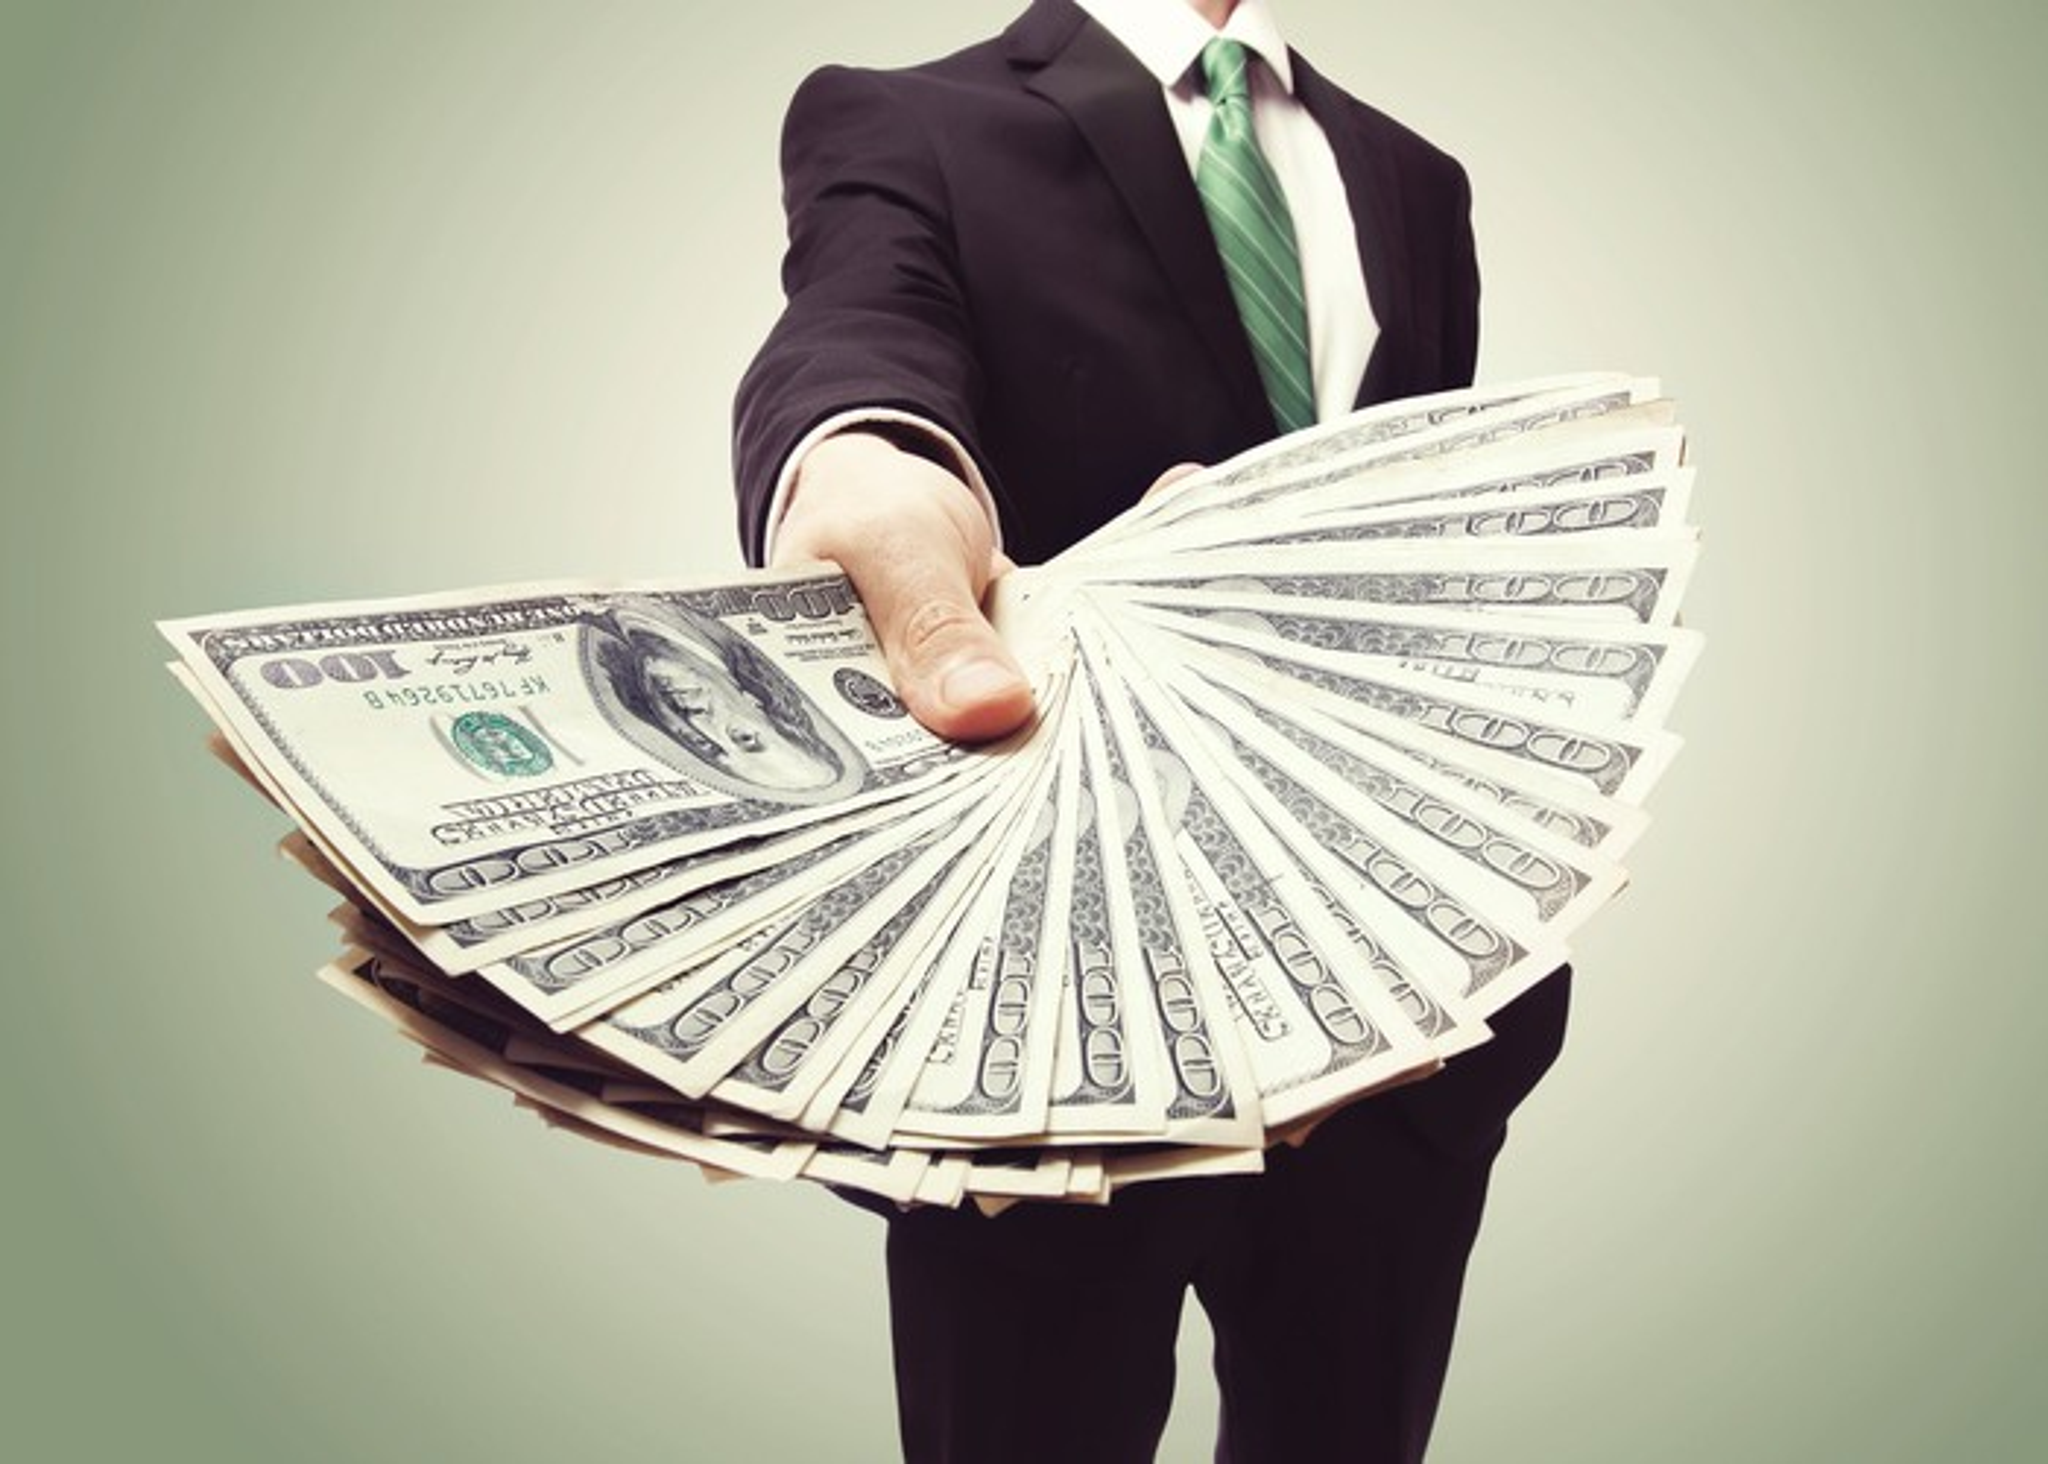 A businessperson handing out cash